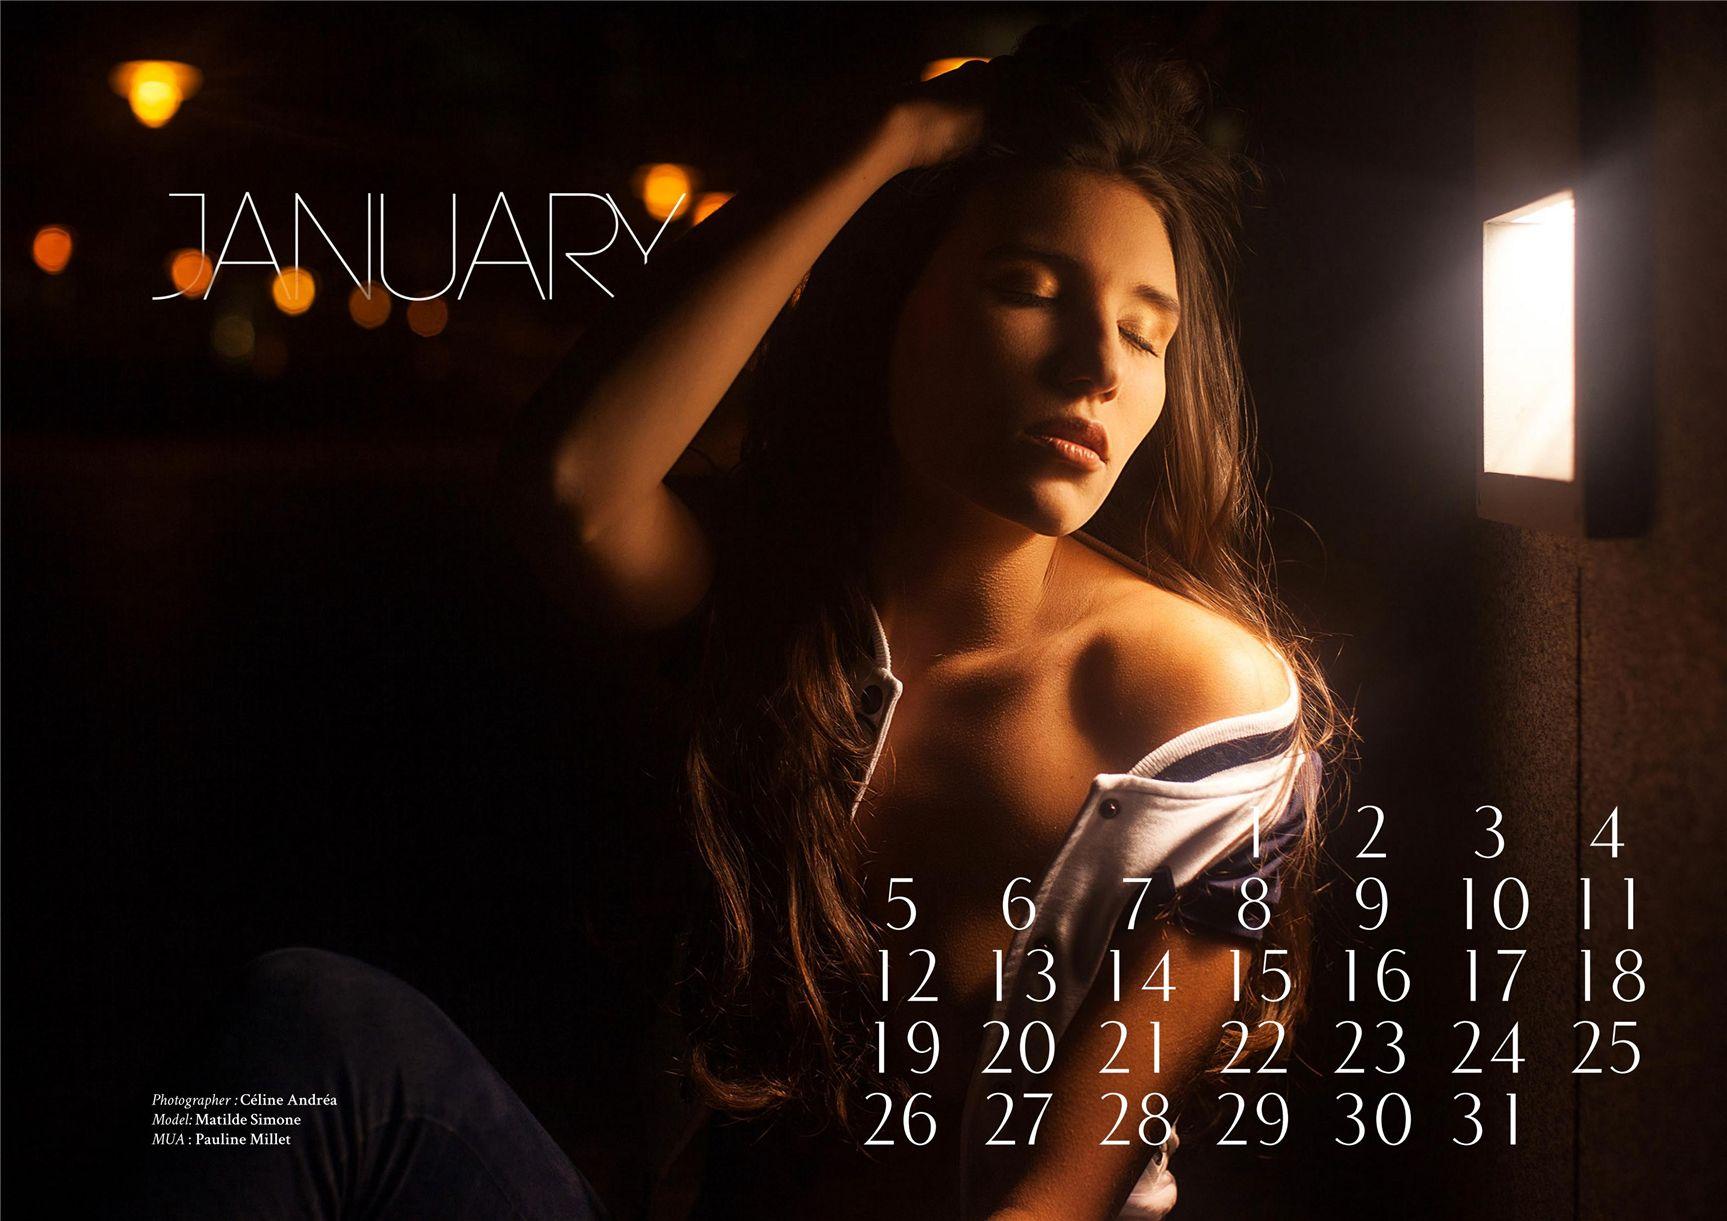 модно-артистический календарь журнала Bizart 2015 calendar - Matilde Simone by Celine Andrea